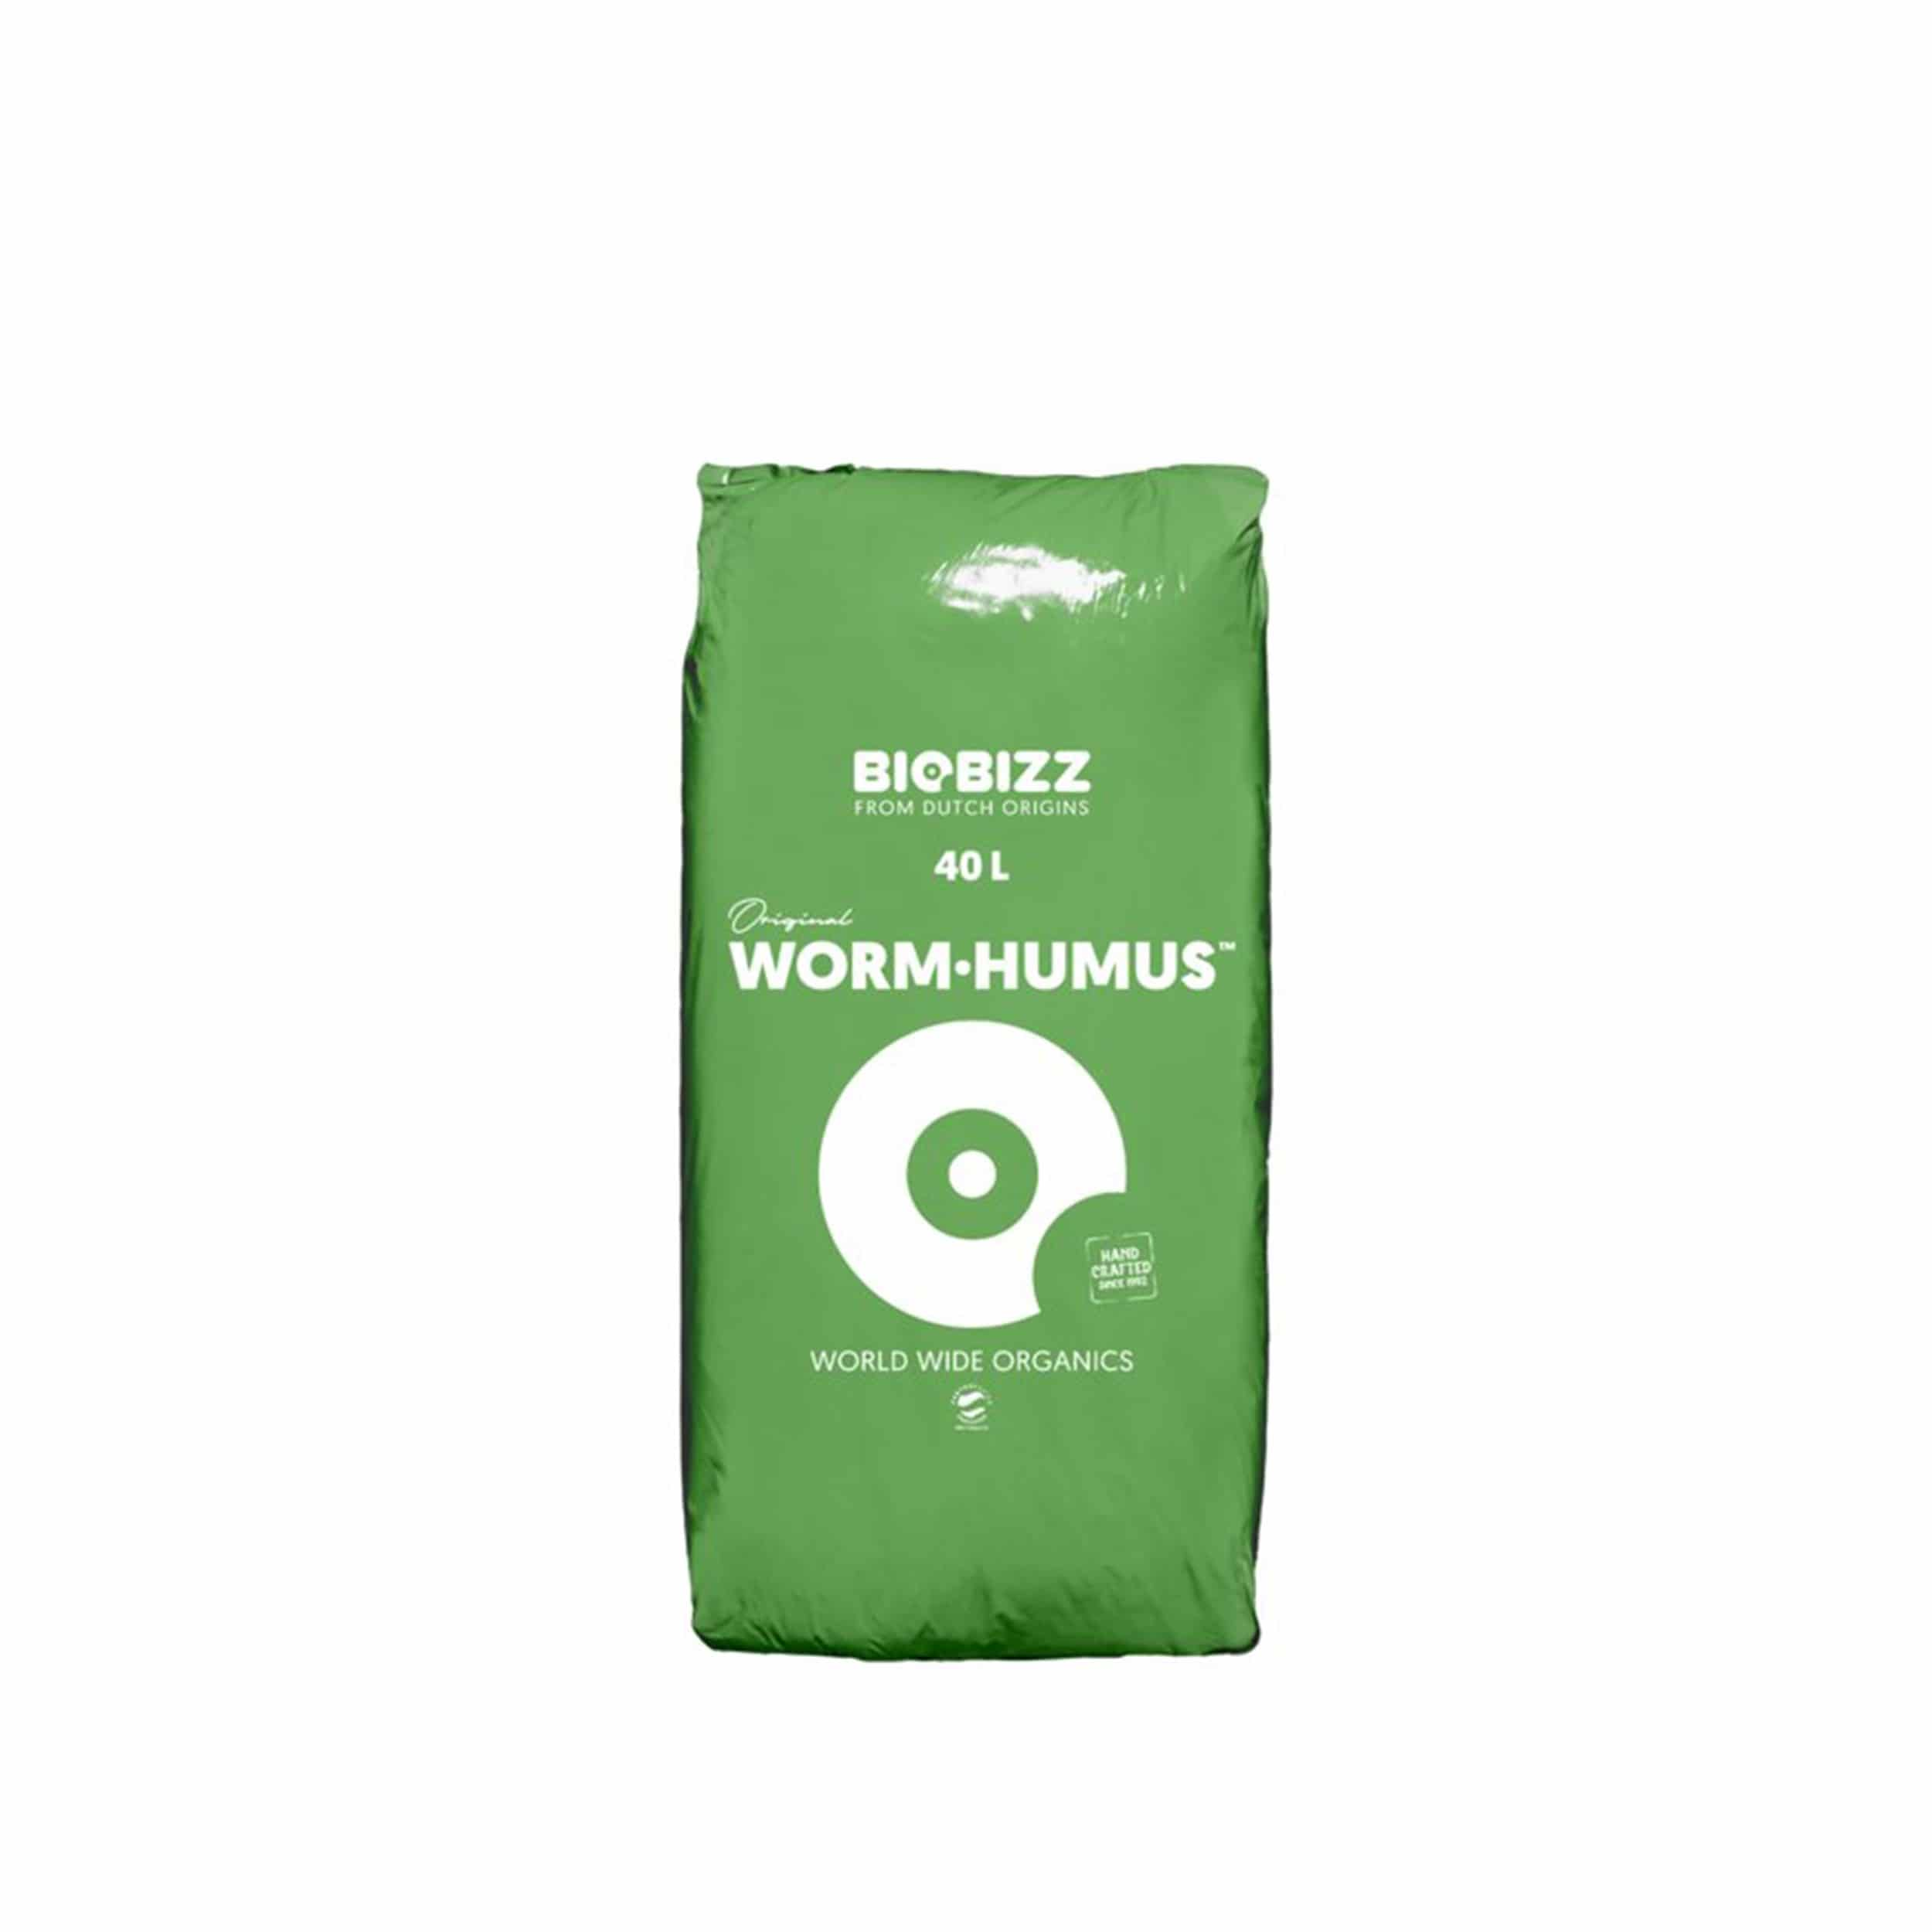 Kompost-Erde Wurm-Humus 40 Liter